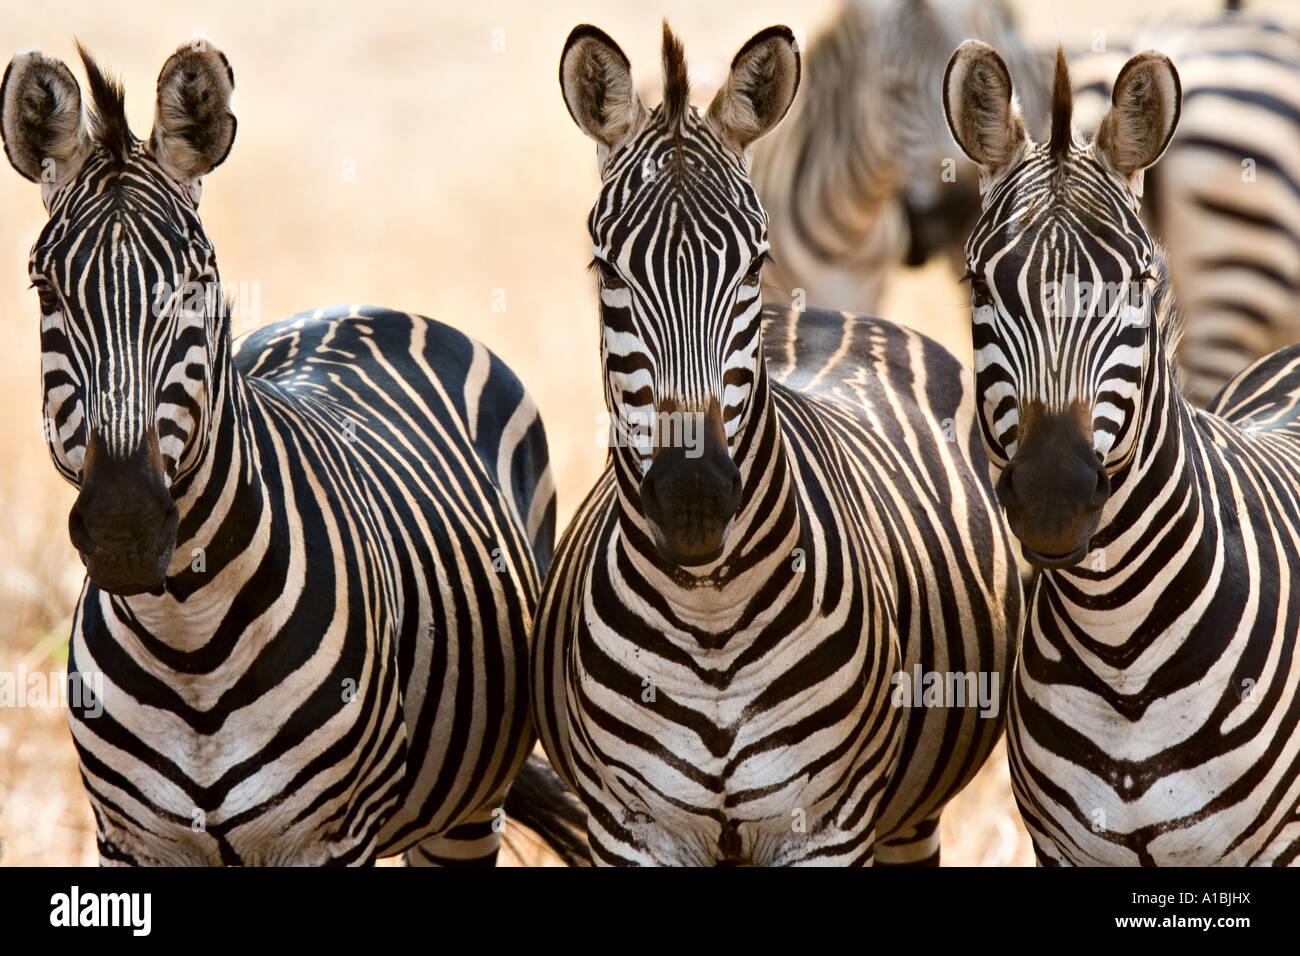 Boehmi Zebras (Equus Quagga Boehmi) in Tarangire National Park, Tanzania, Africa - Stock Image